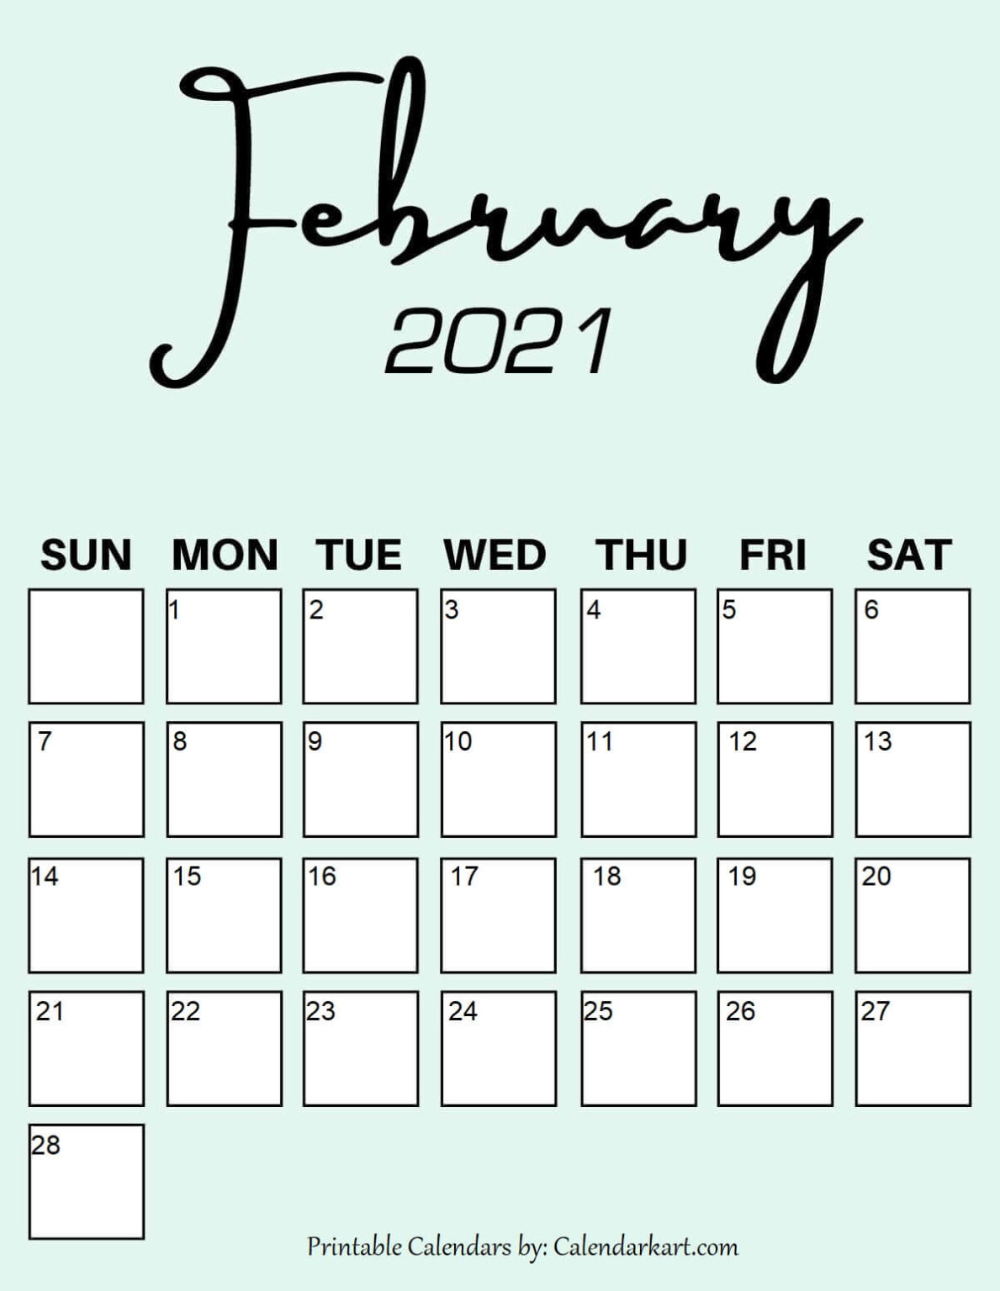 February 2021 Calendar Cute Cute & Free Printable February 2021 Calendars { 6 Pretty Designs